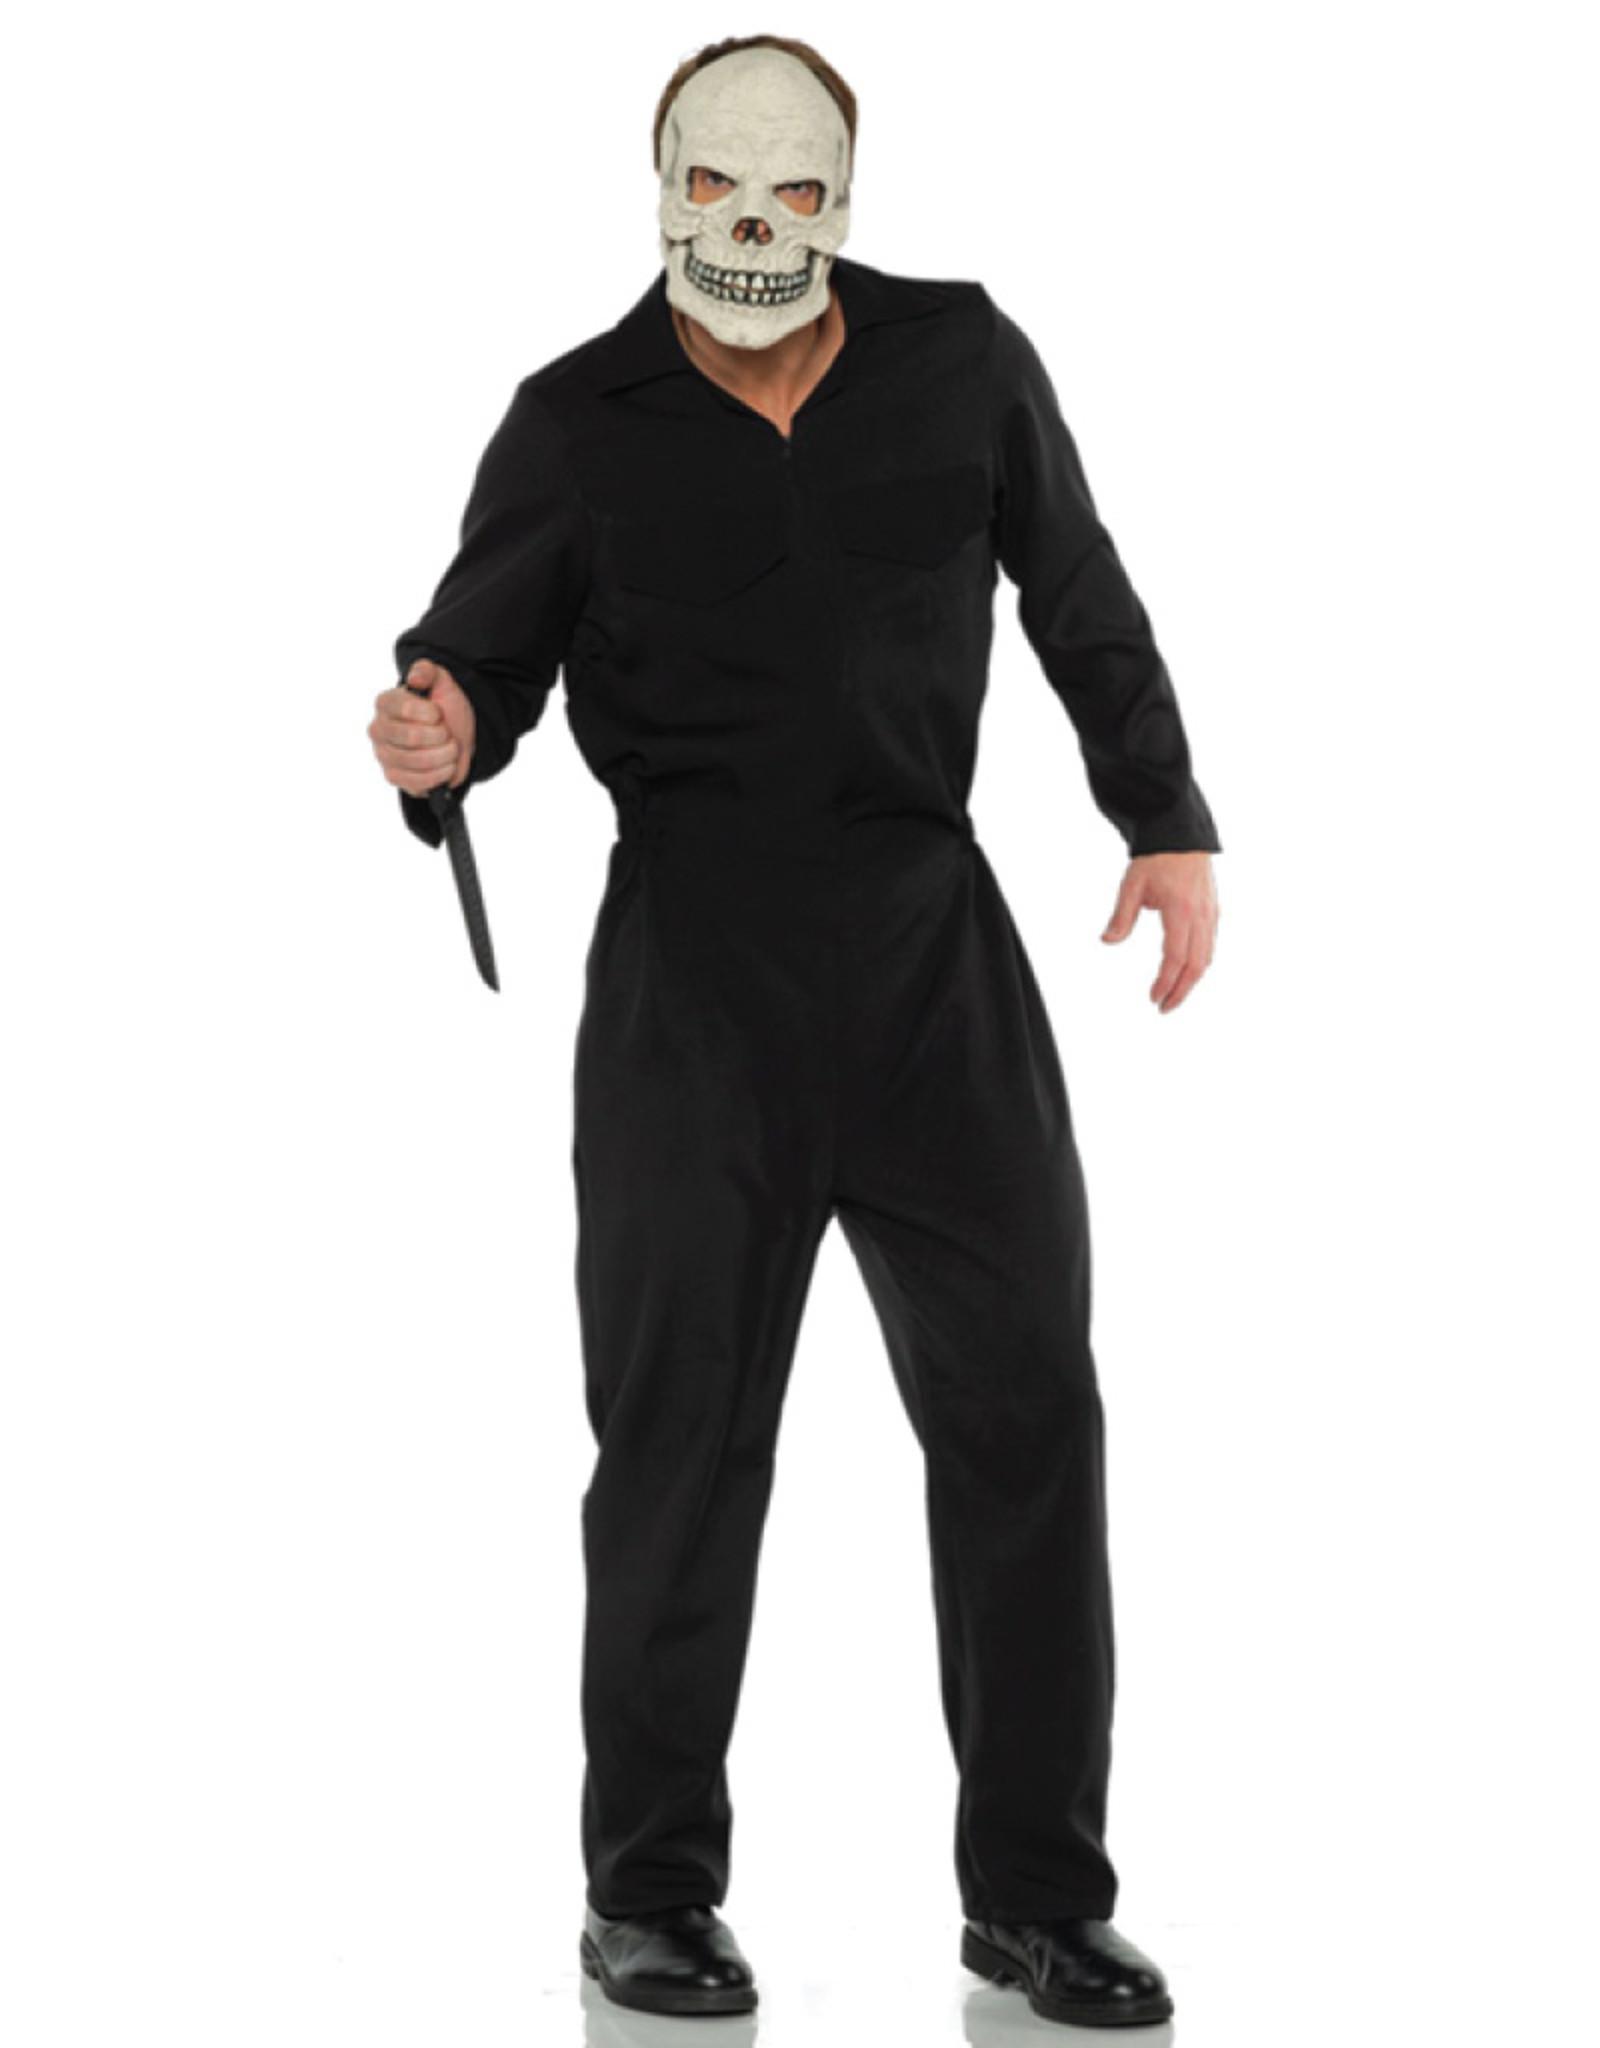 Boiler Black Suit - Men